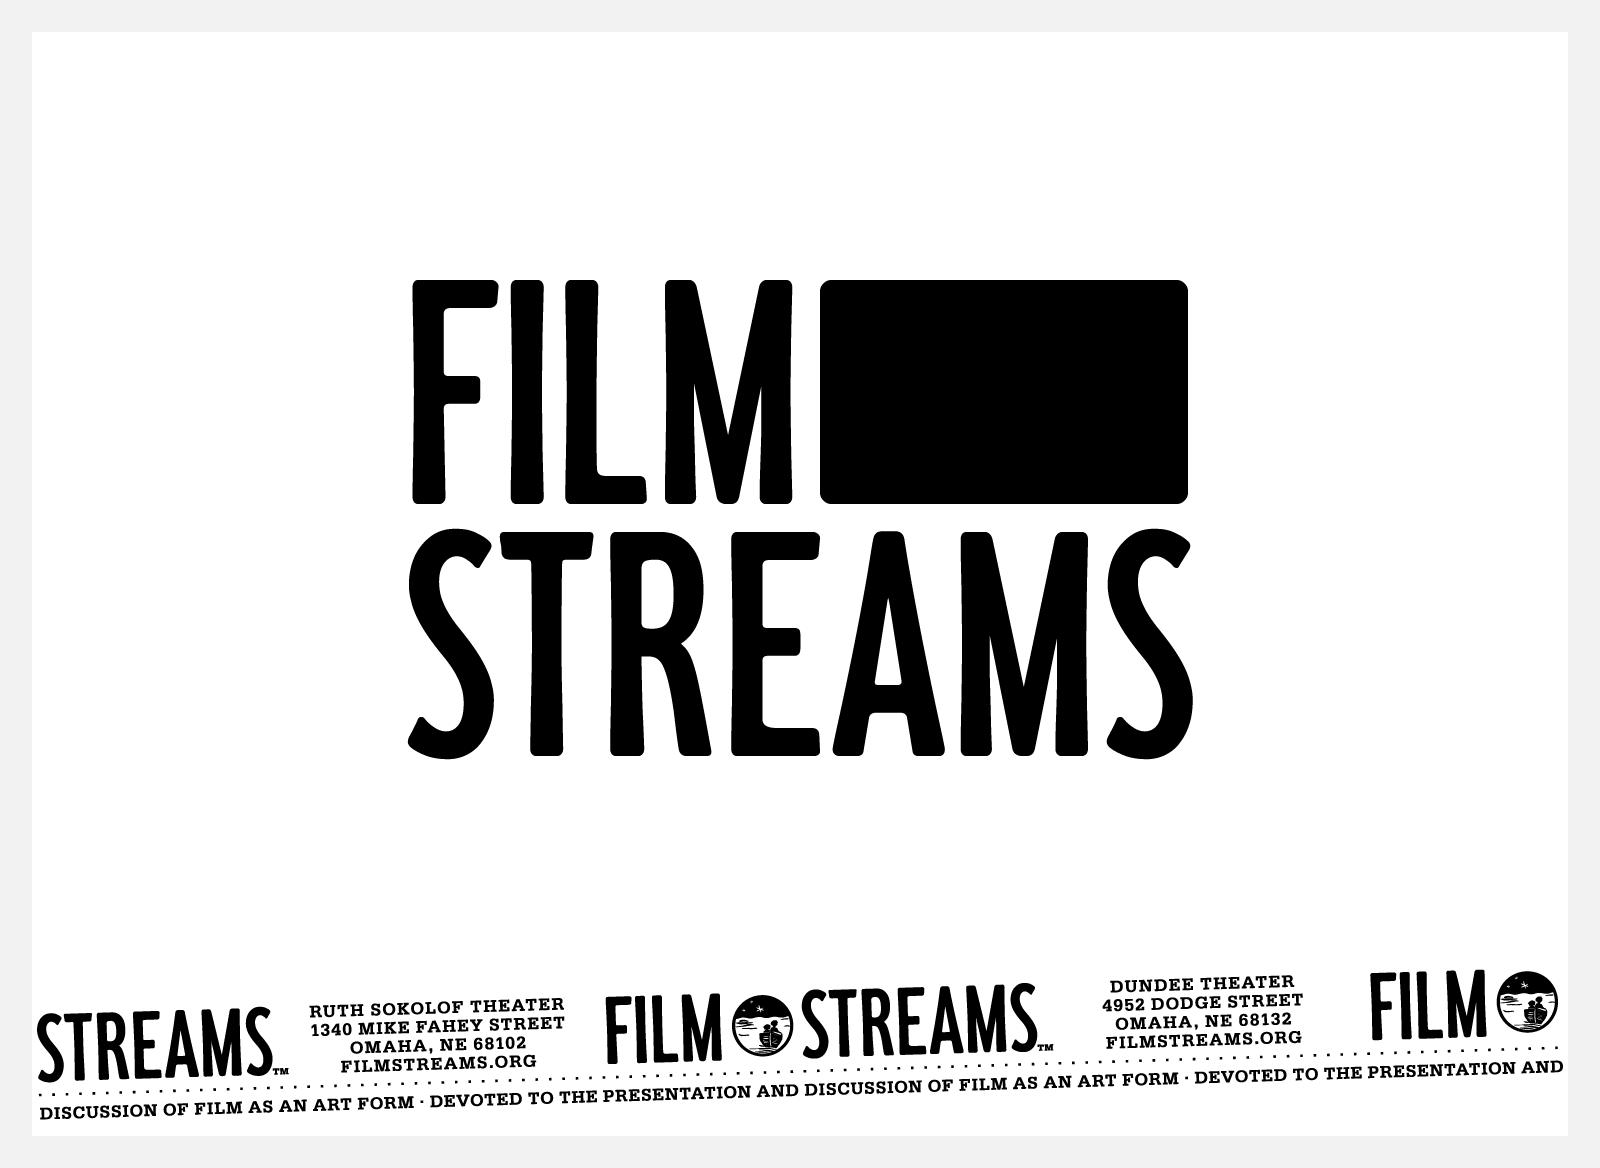 jkdc_filmstreams-logo.png